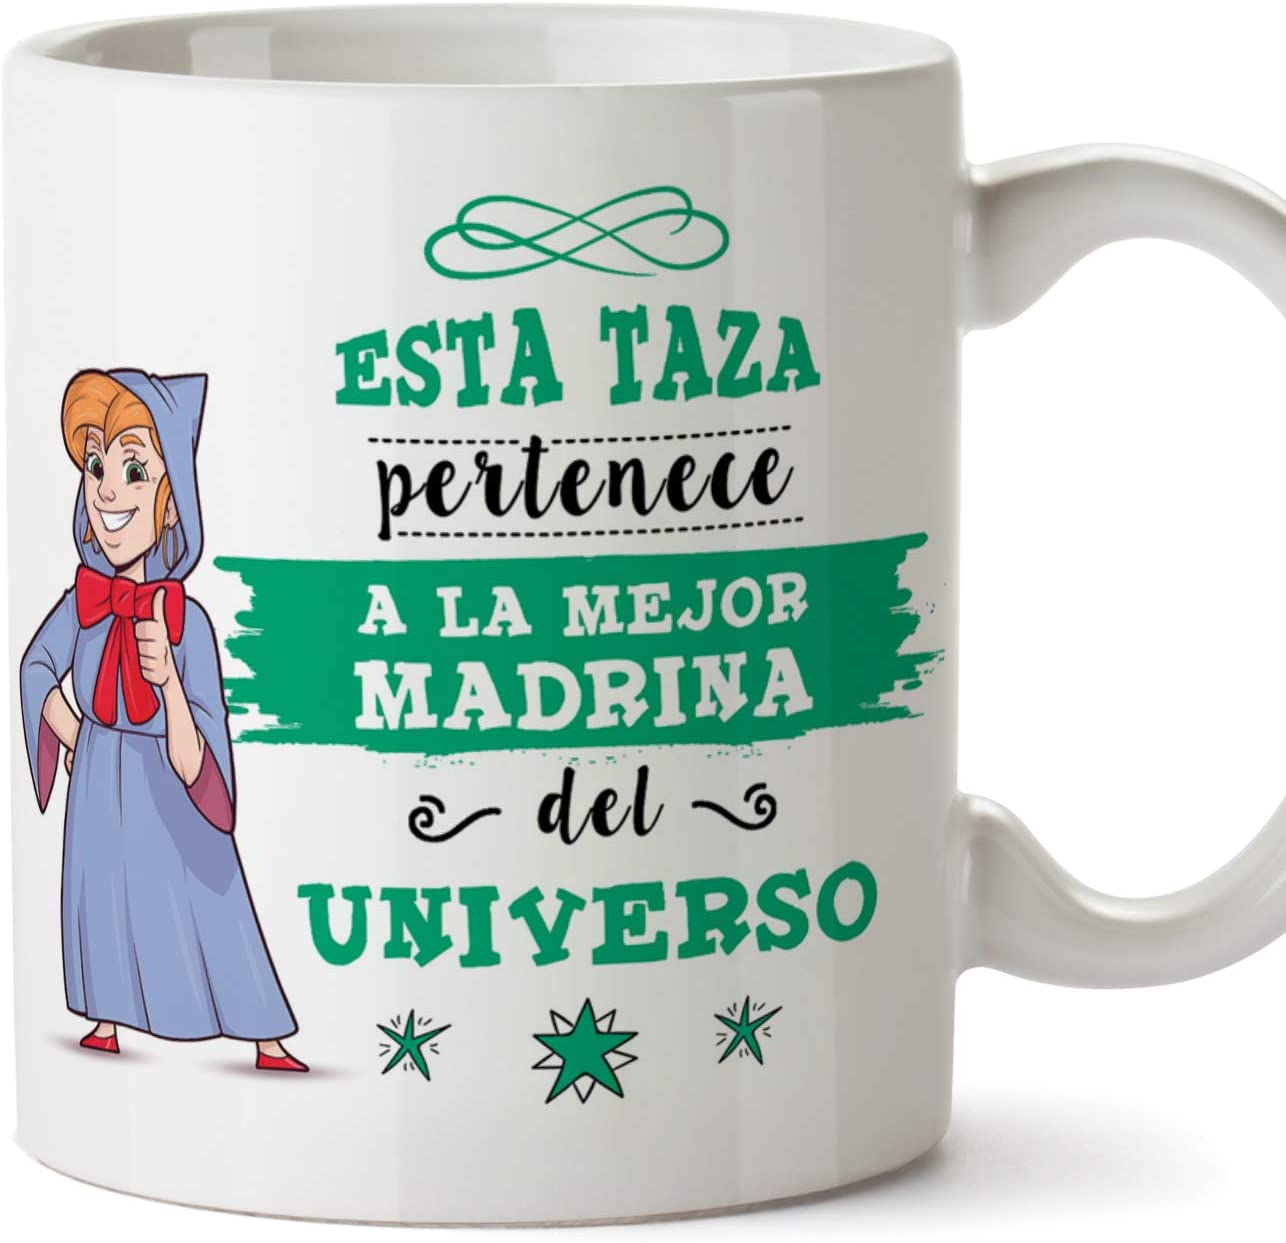 MUGFFINS Taza Madrina - Esta Taza Pertenece a la Mejor Madrina del Universo - Taza Desayuno/Idea Regalo Día de Pascua. Cerámica 350 mL